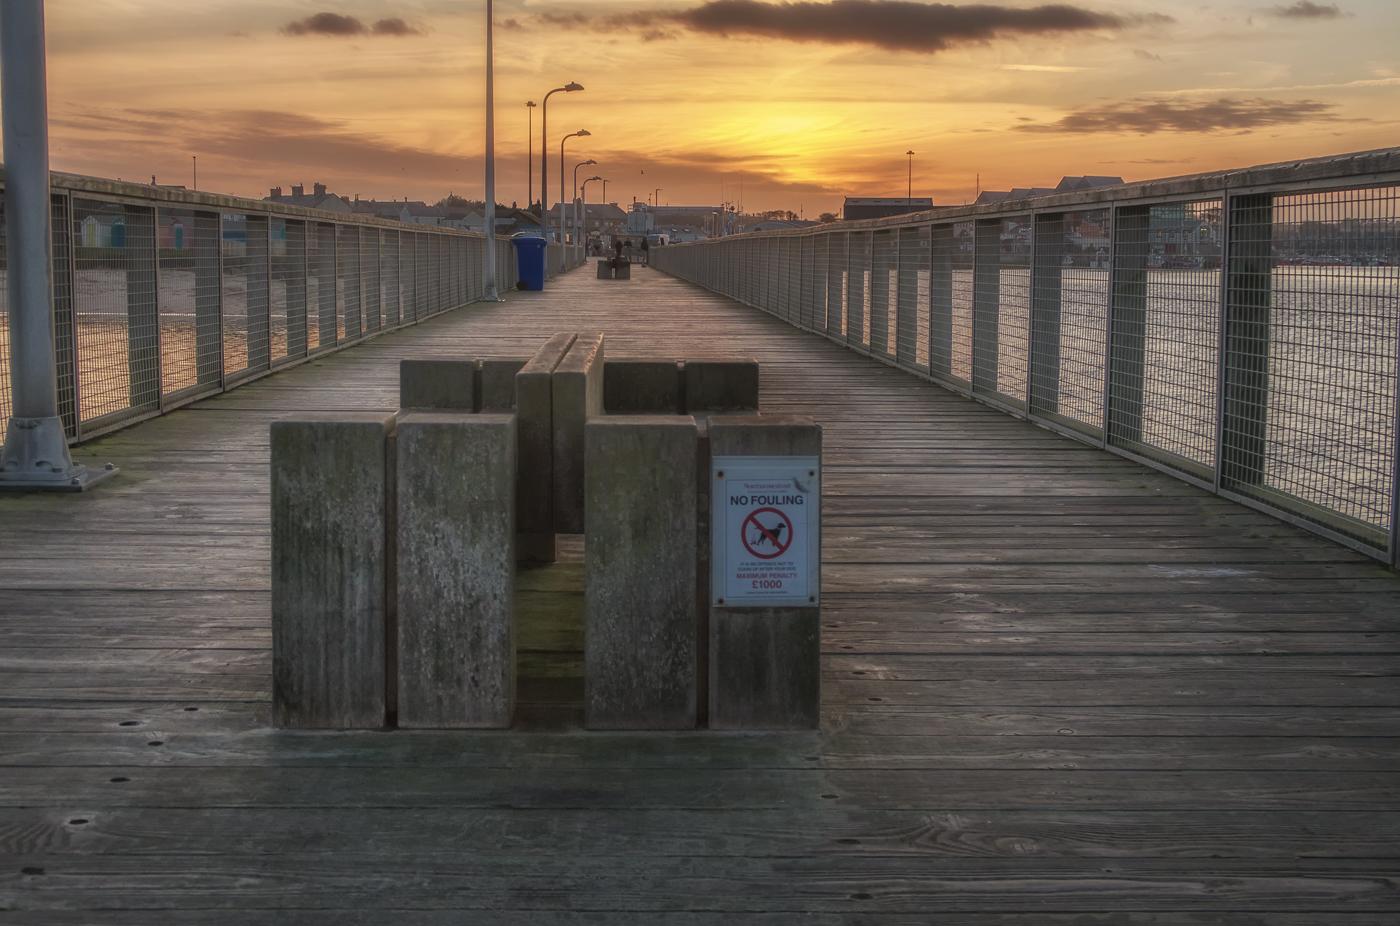 Sunset at Amble Pier